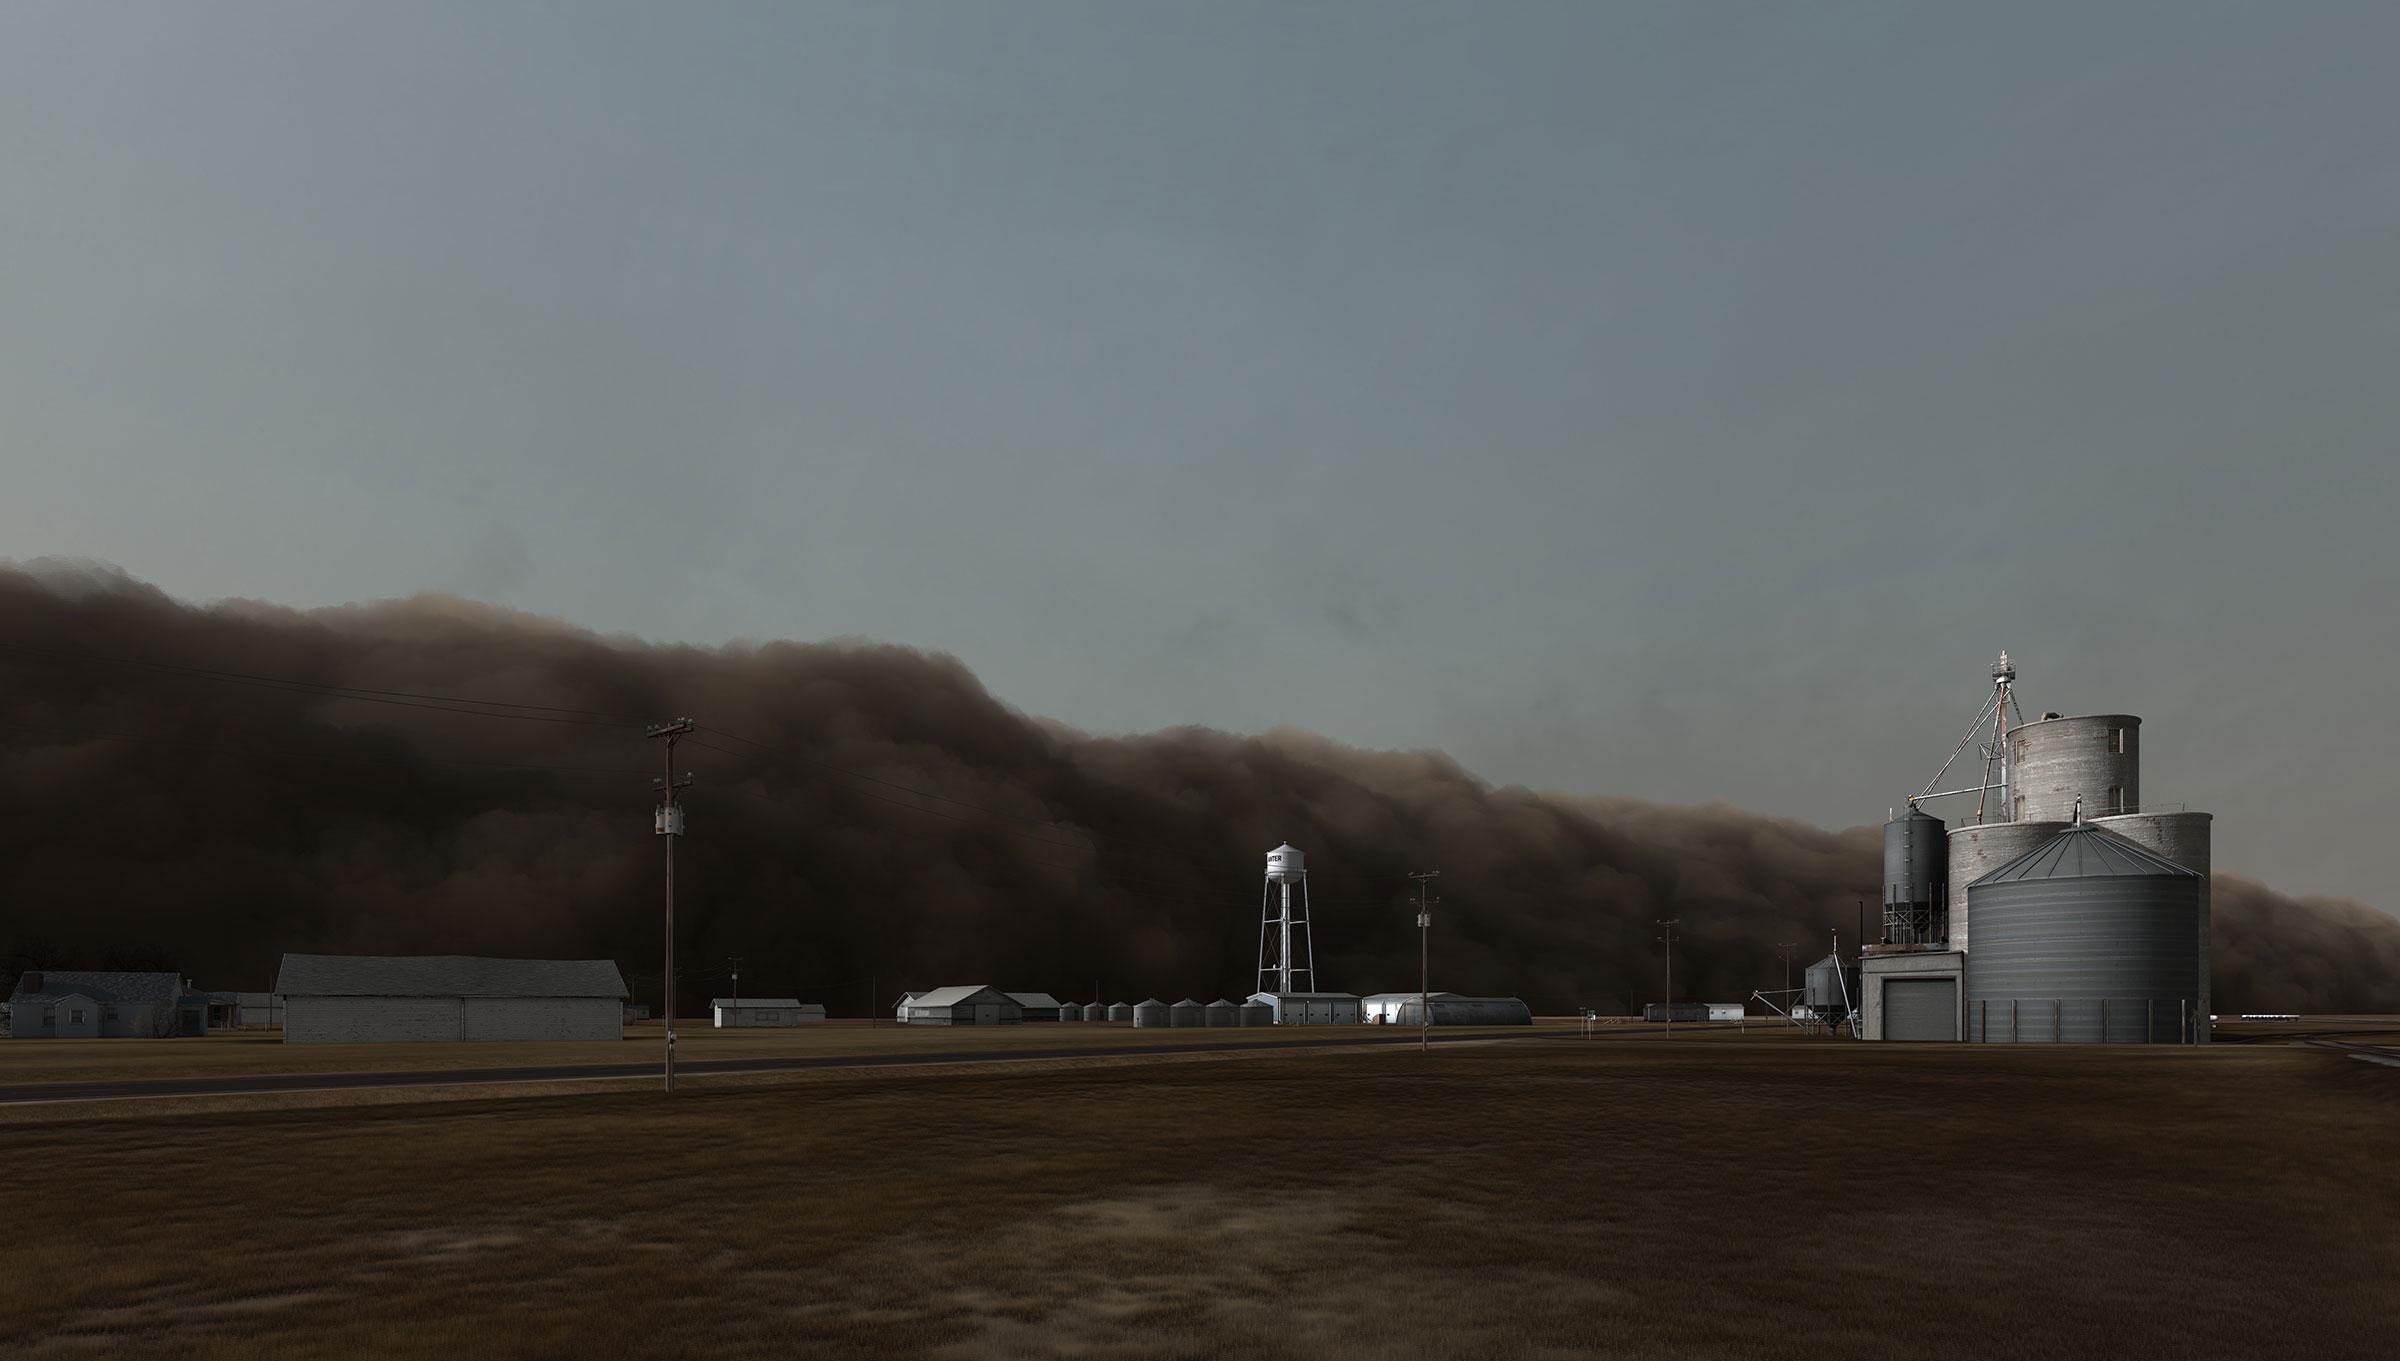 Kansas stanton county manter - Dust Storm Manter Kansas 2007